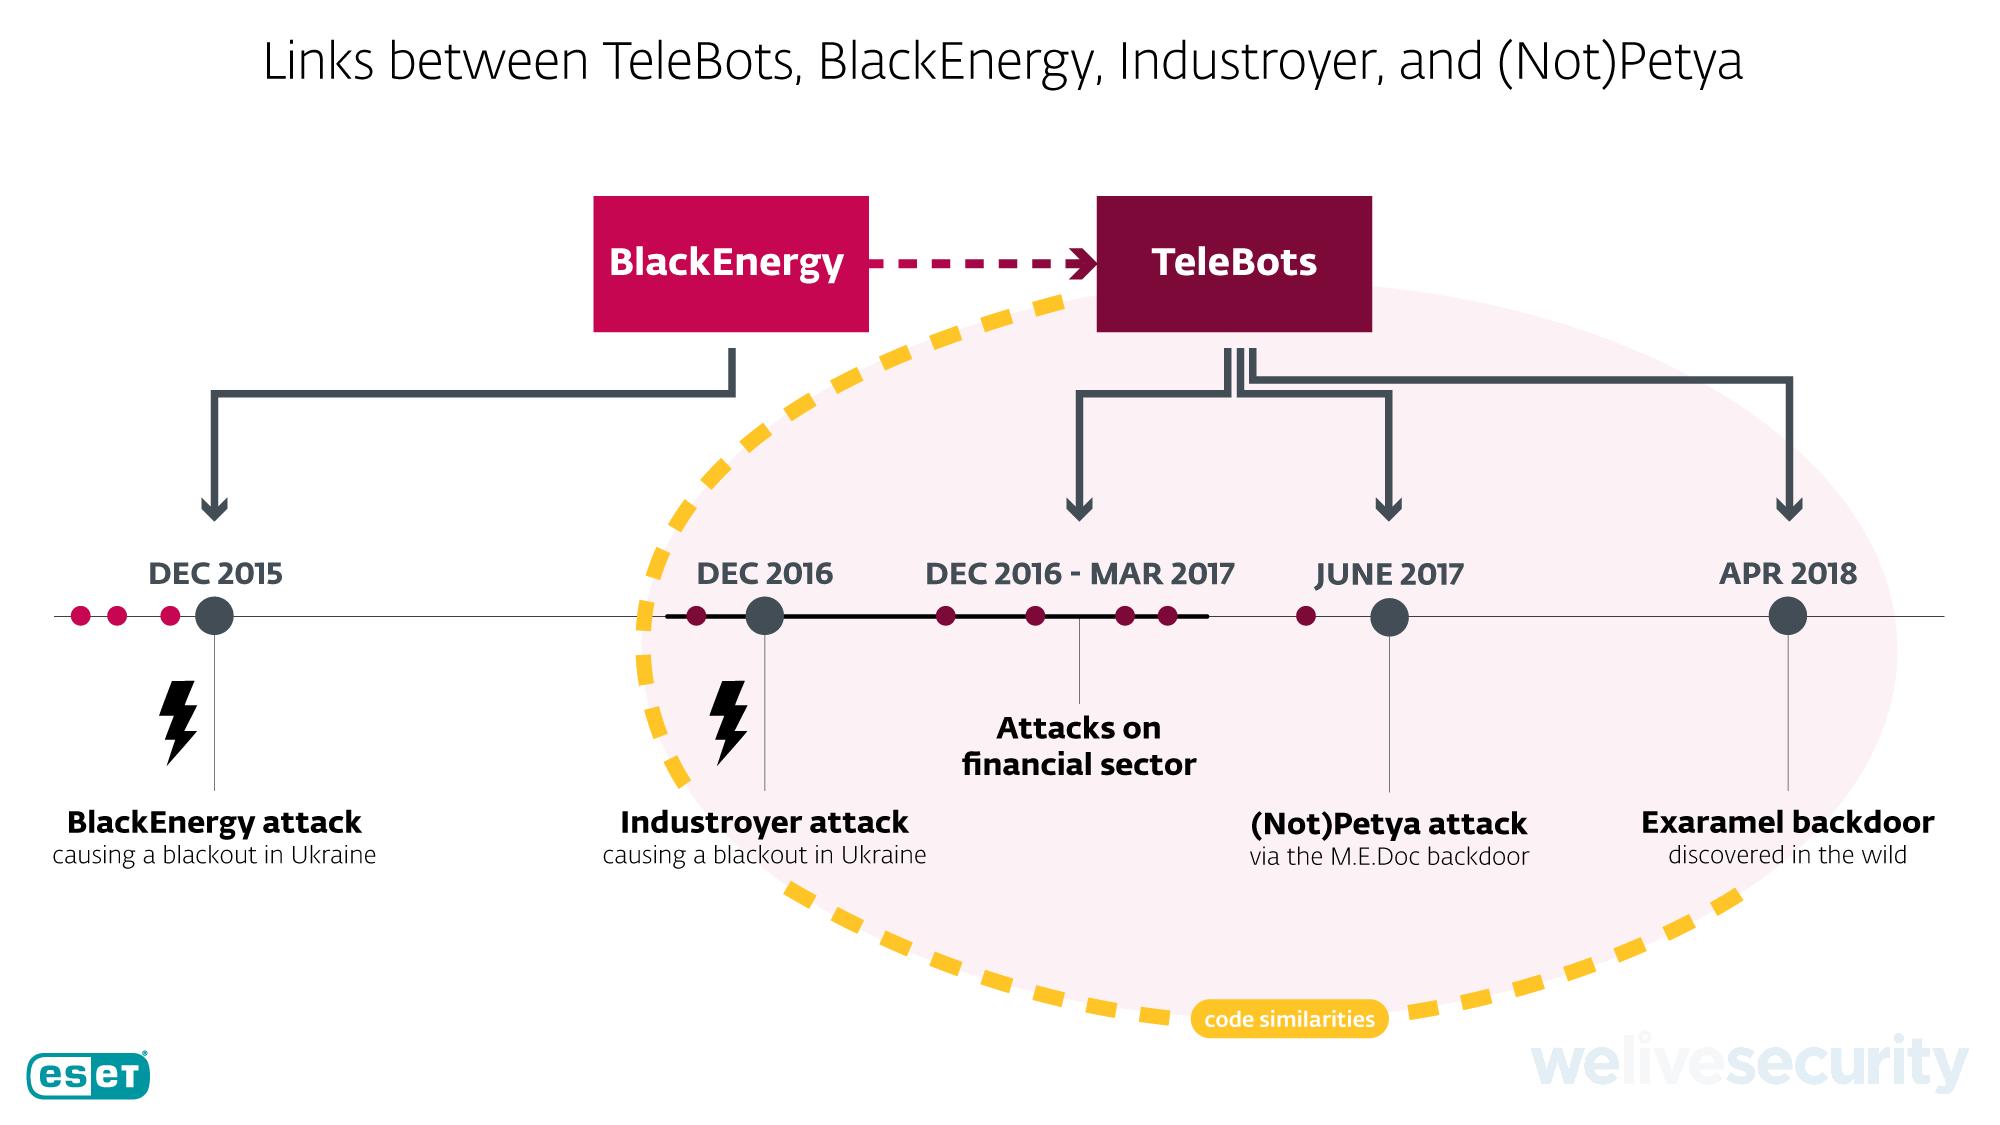 Кибератаки группы BlackEnergy/TeleBots